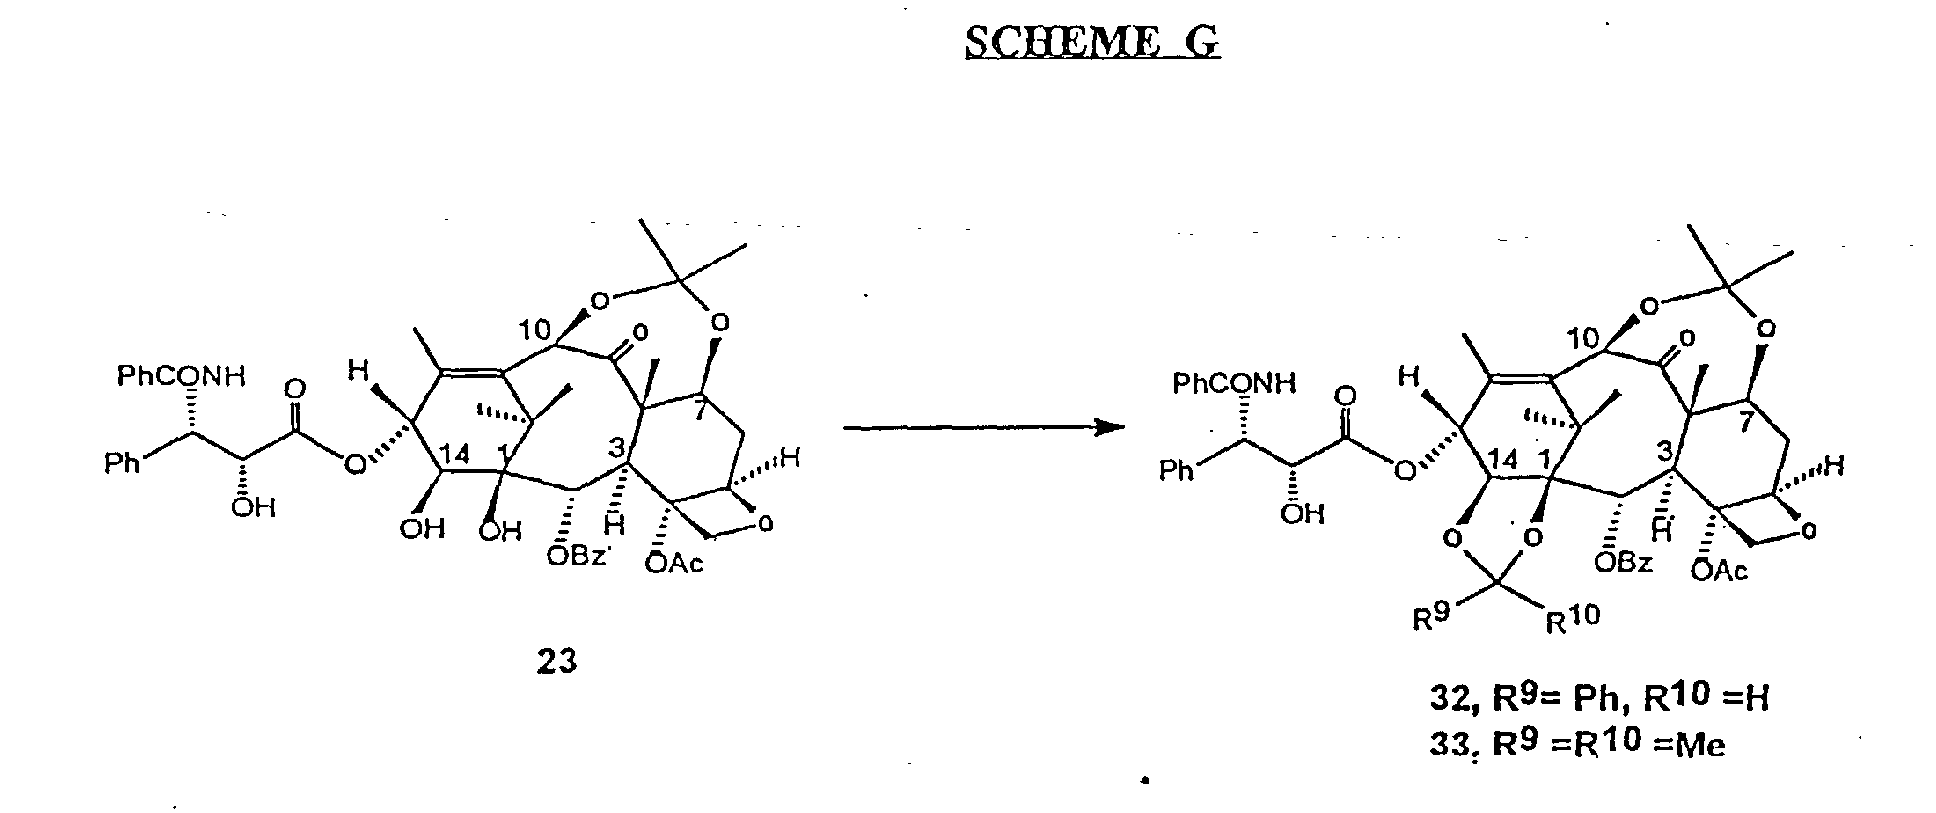 EP1099696A2 - Preparation of oxazolidine - Google Patents